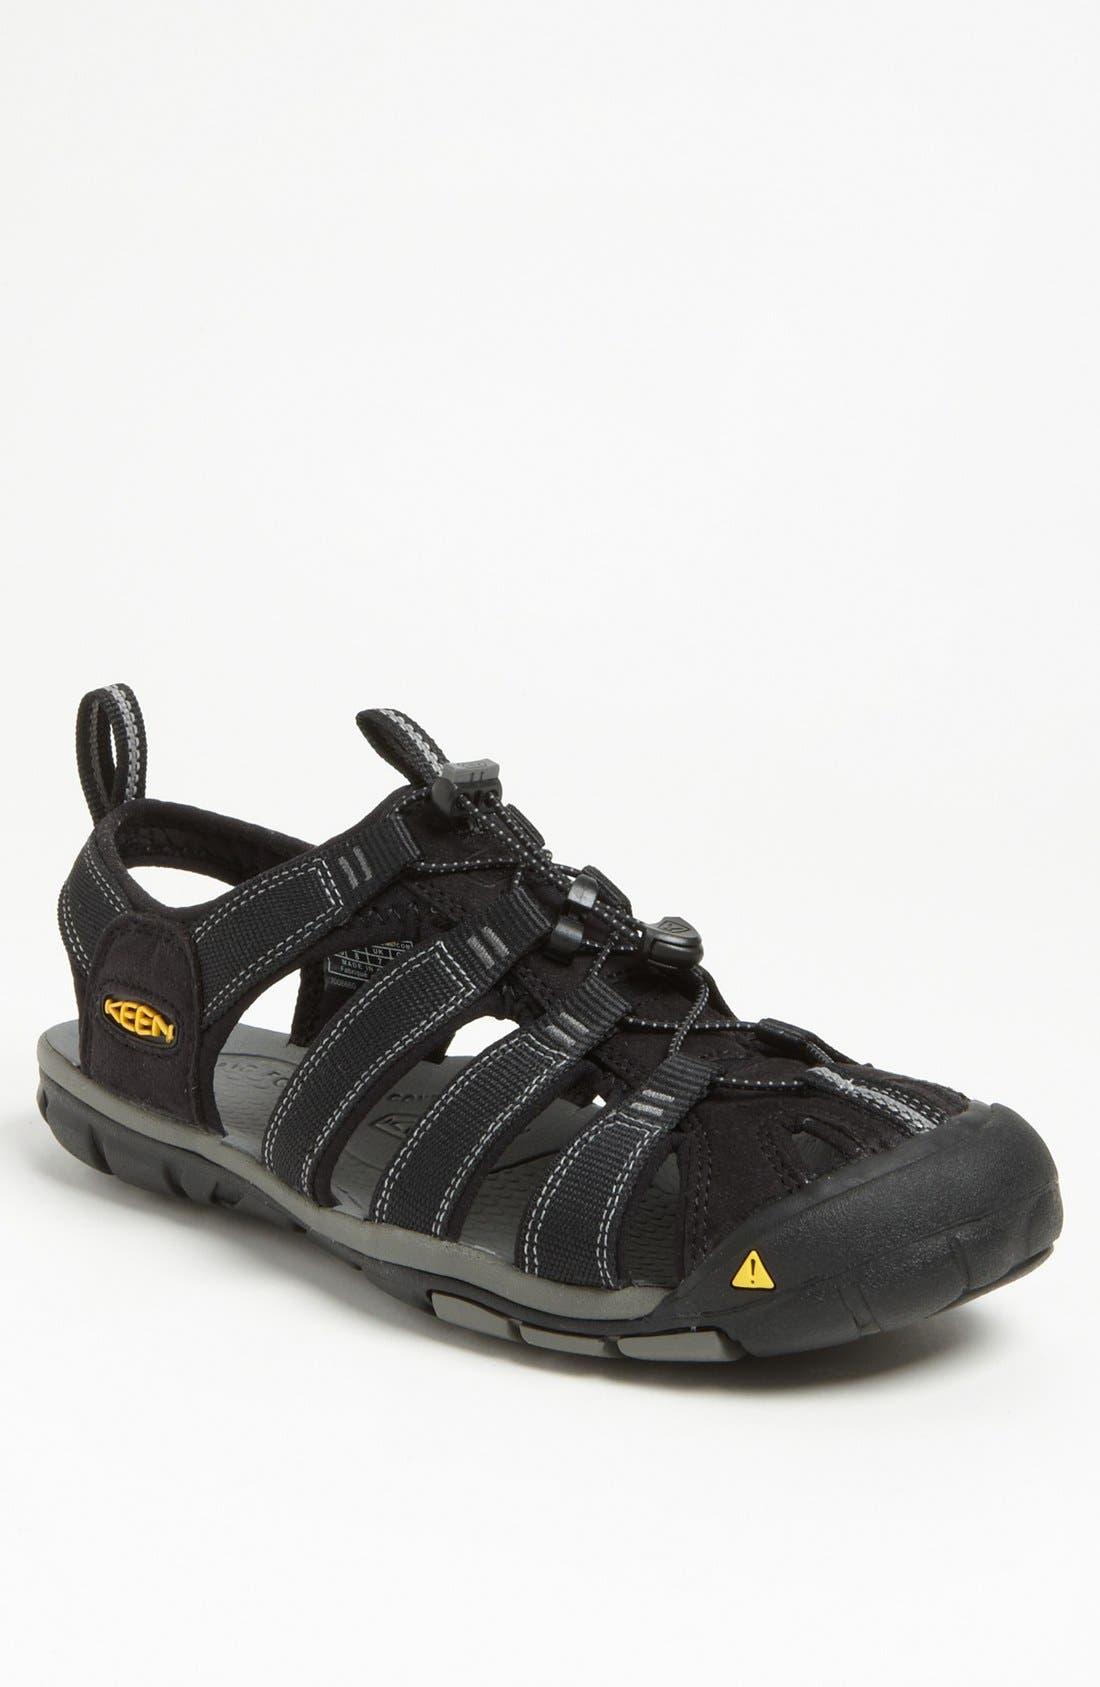 'Clearwater CNX' Sandal,                             Main thumbnail 1, color,                             Black/ Gargoyle